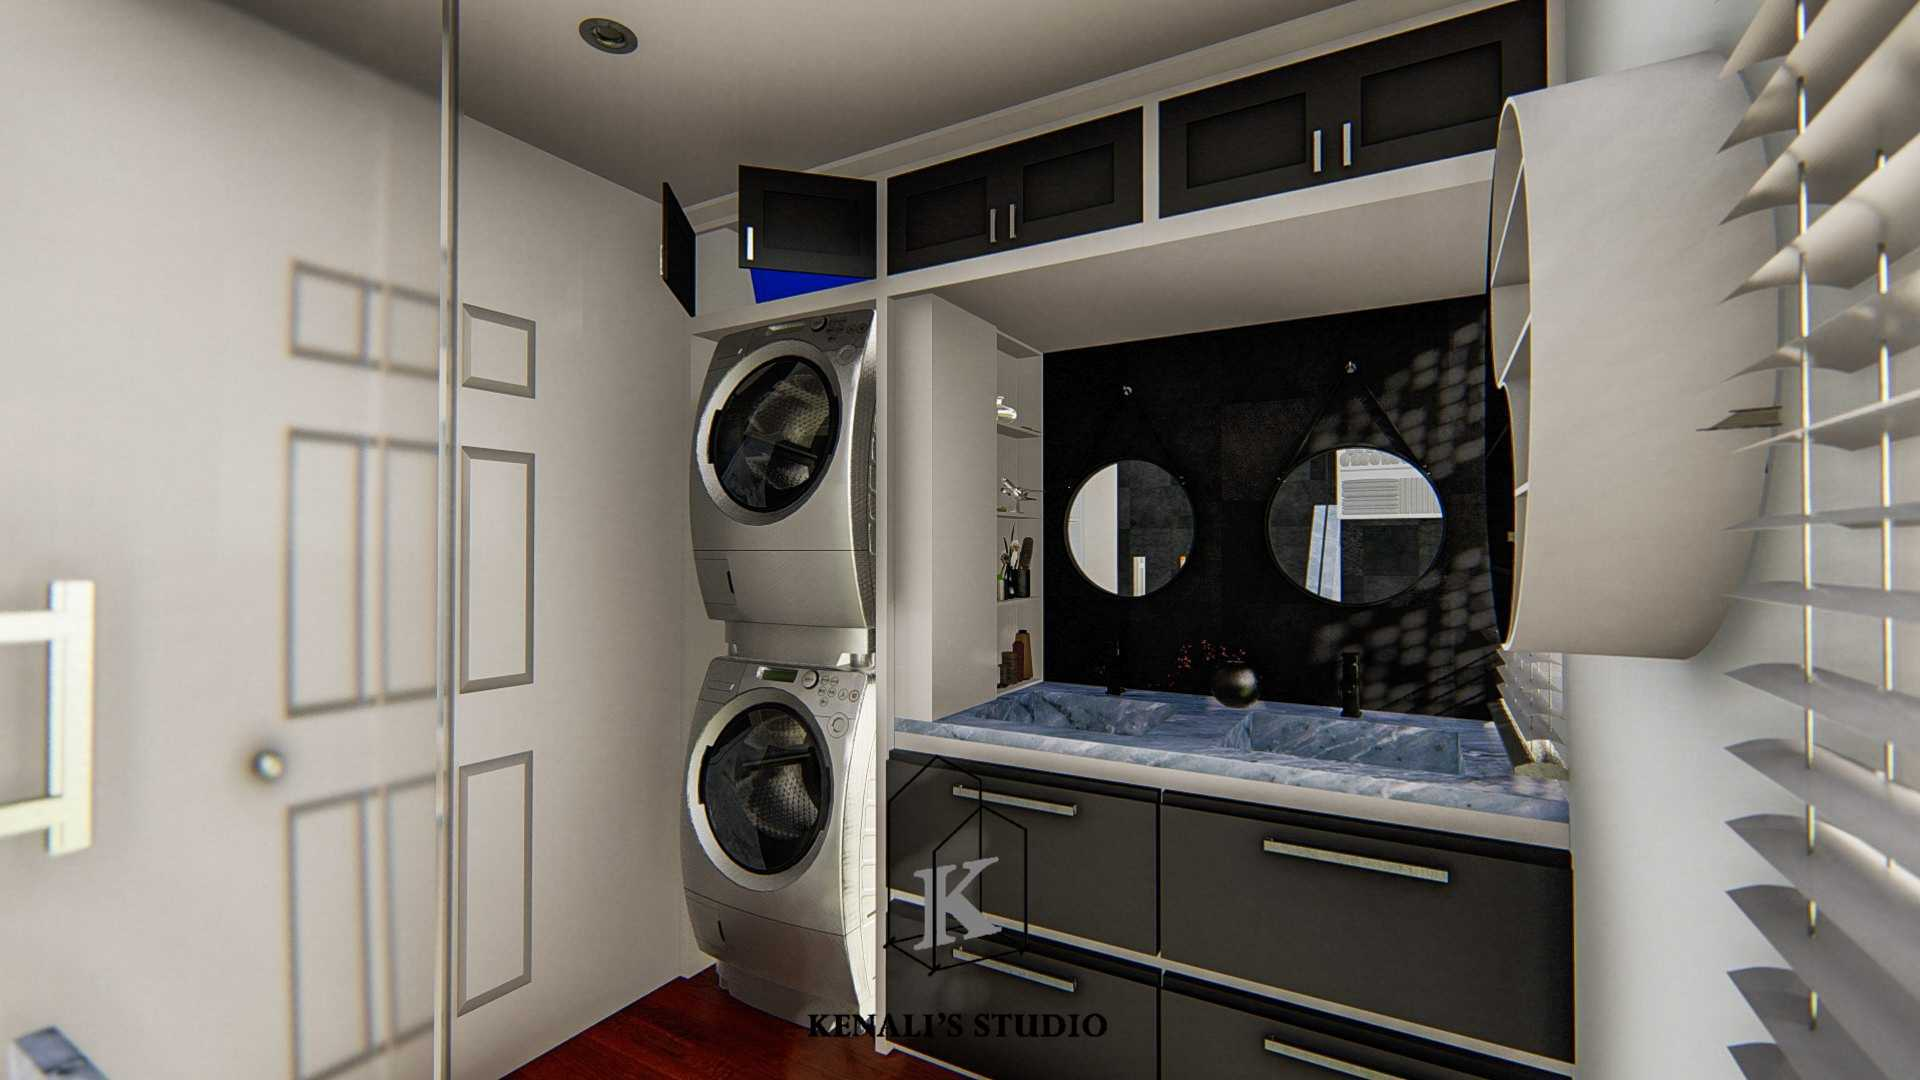 Kenali's Studio Project : Laundry & Bathroom Amerika Serikat Amerika Serikat Kenalis-Studio-Project-Laundry-Bathroom  72920